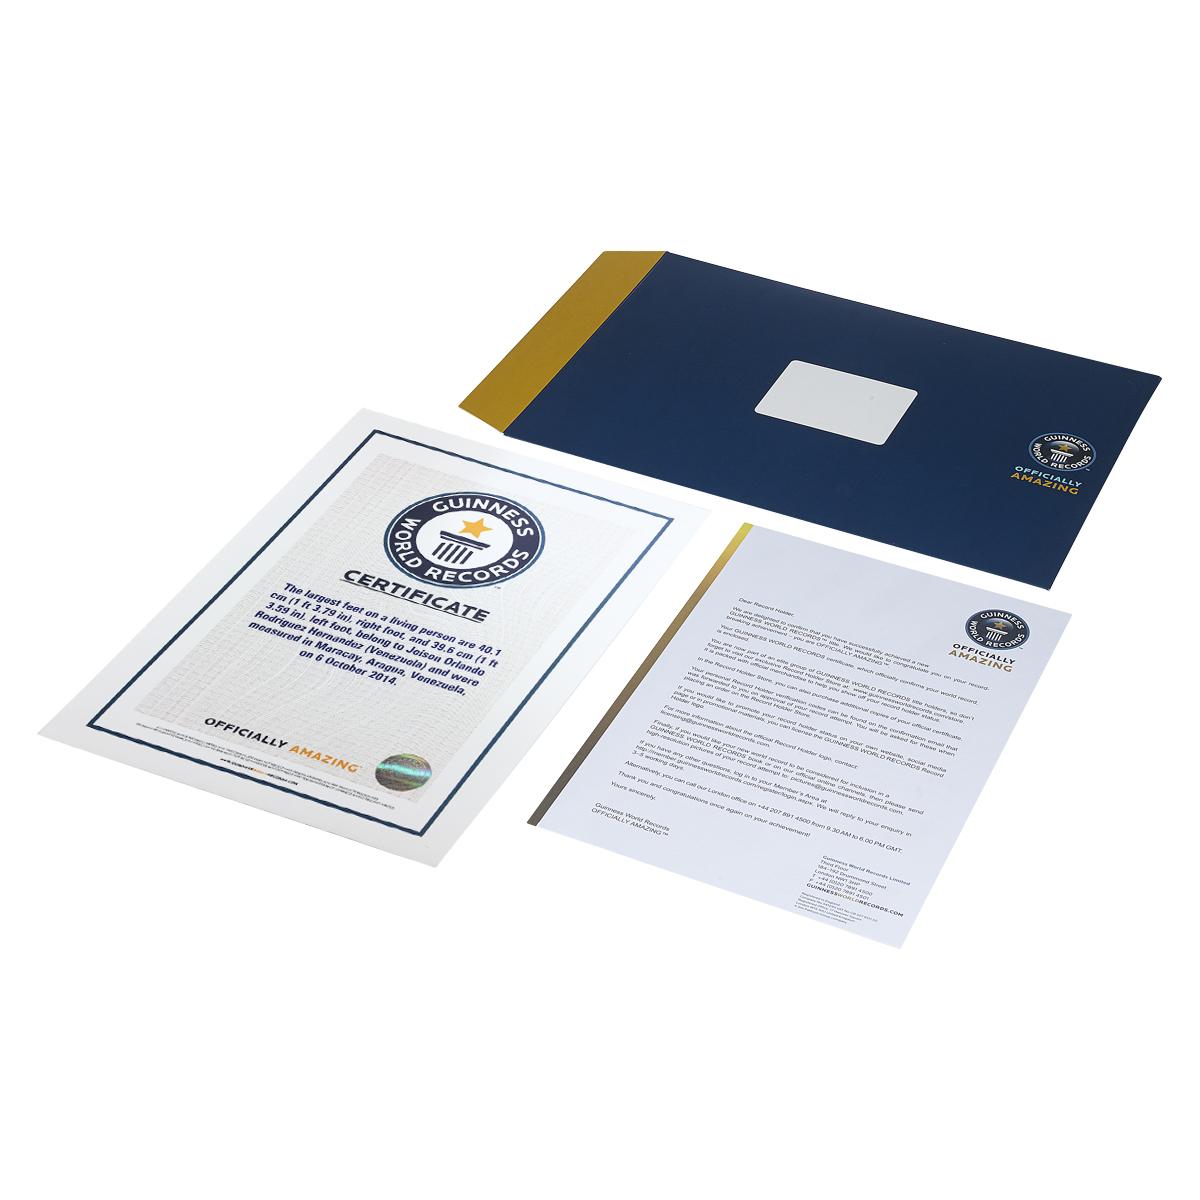 The Guinness World Records Store Certificates Mandegarfo